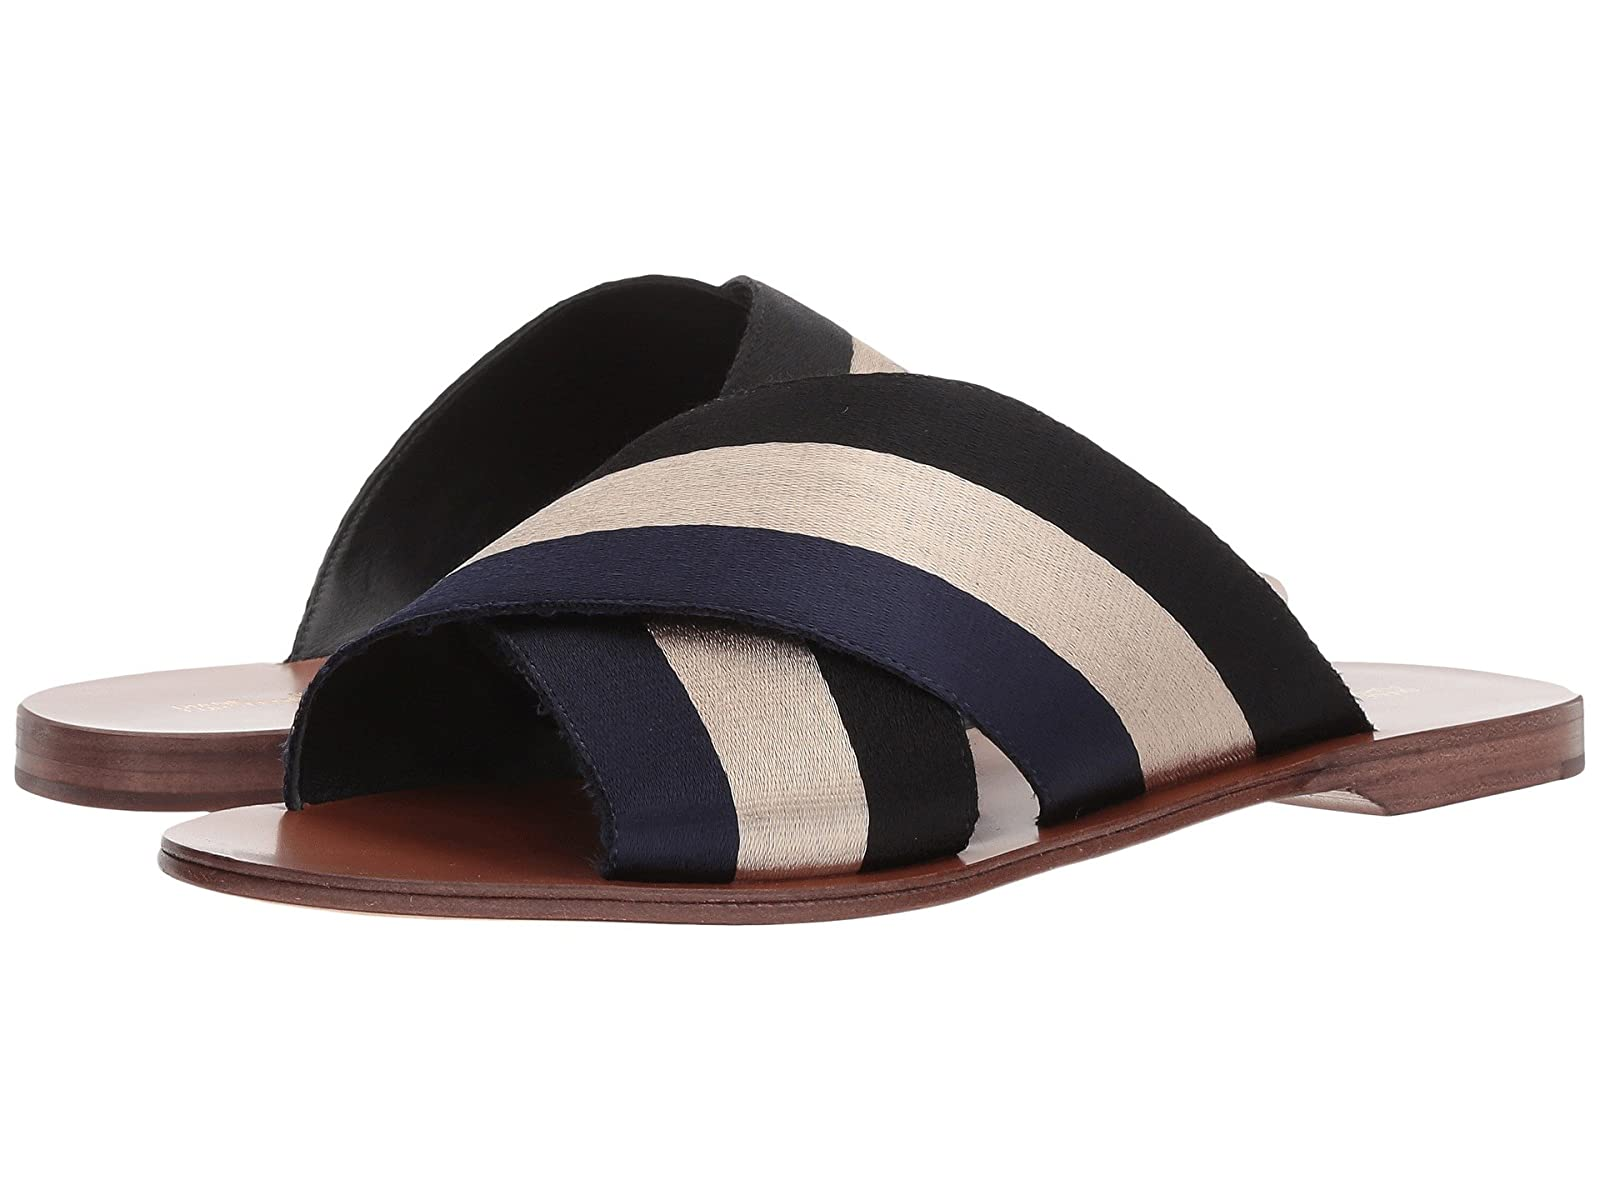 Diane von Furstenberg Bailie-2Comfortable and distinctive shoes